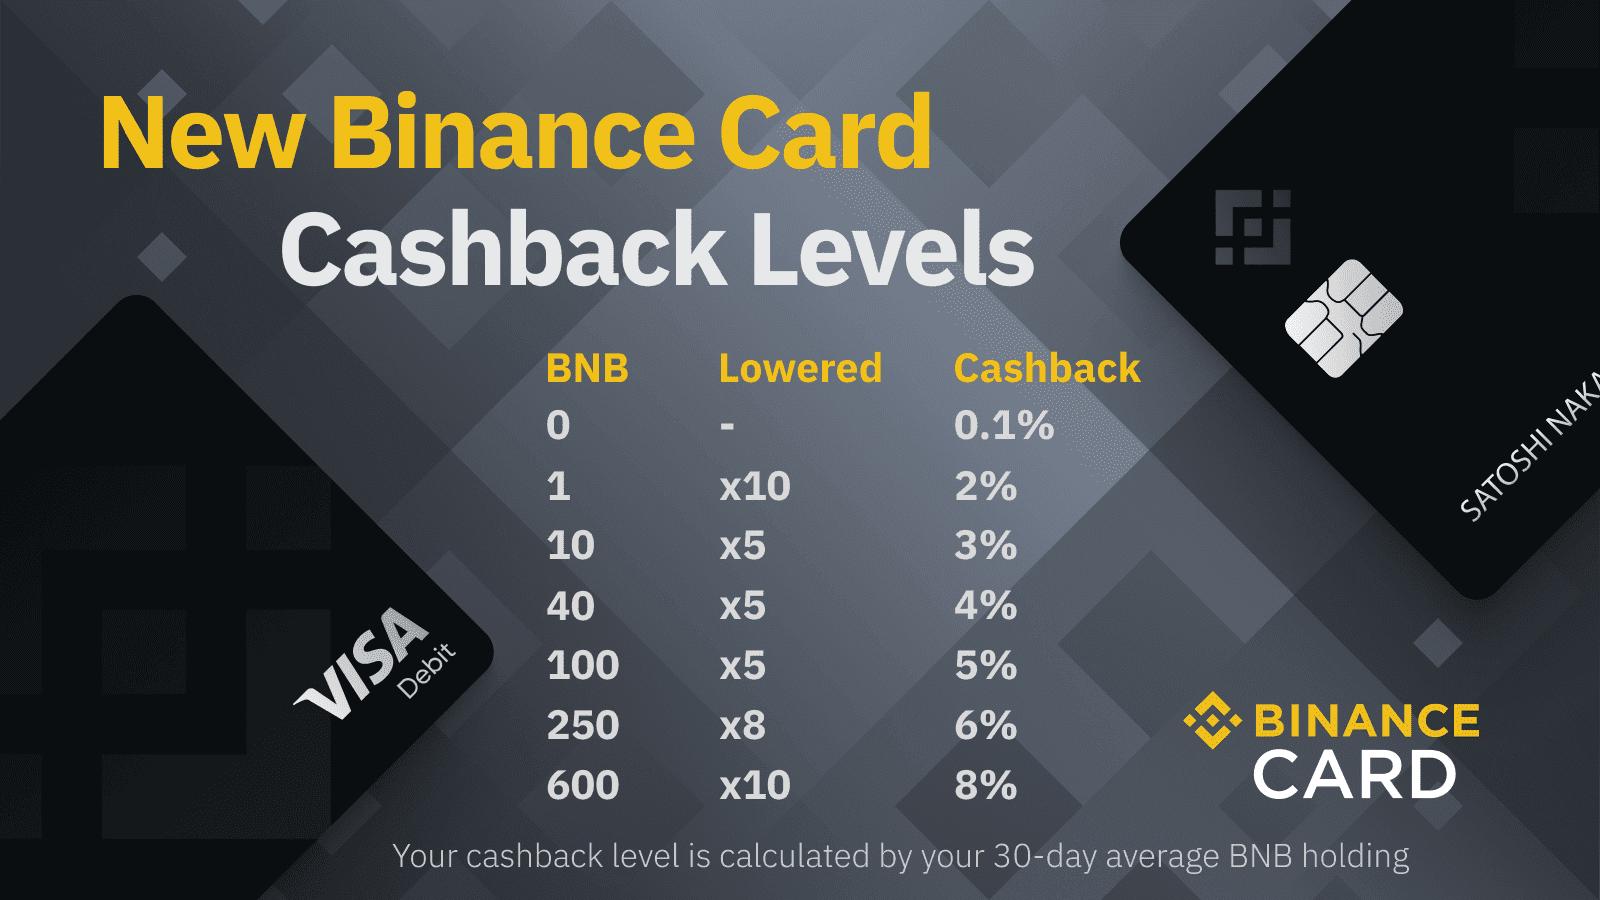 Binance Card Cashback Levels Updated